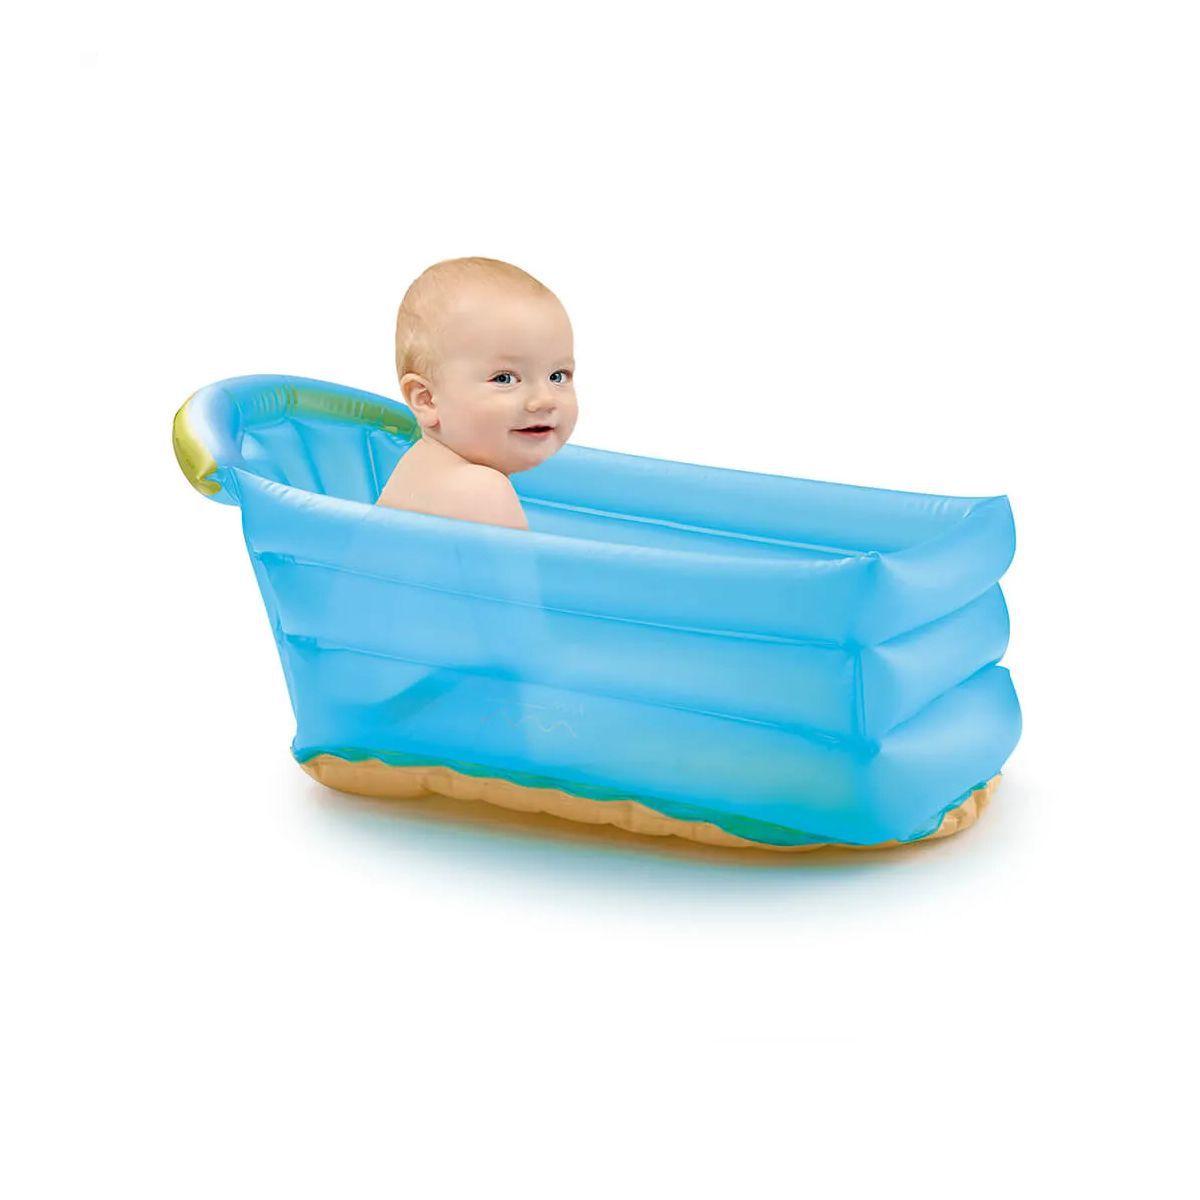 Banheira Inflável Bath Buddy Azul - BB173 - Multikids